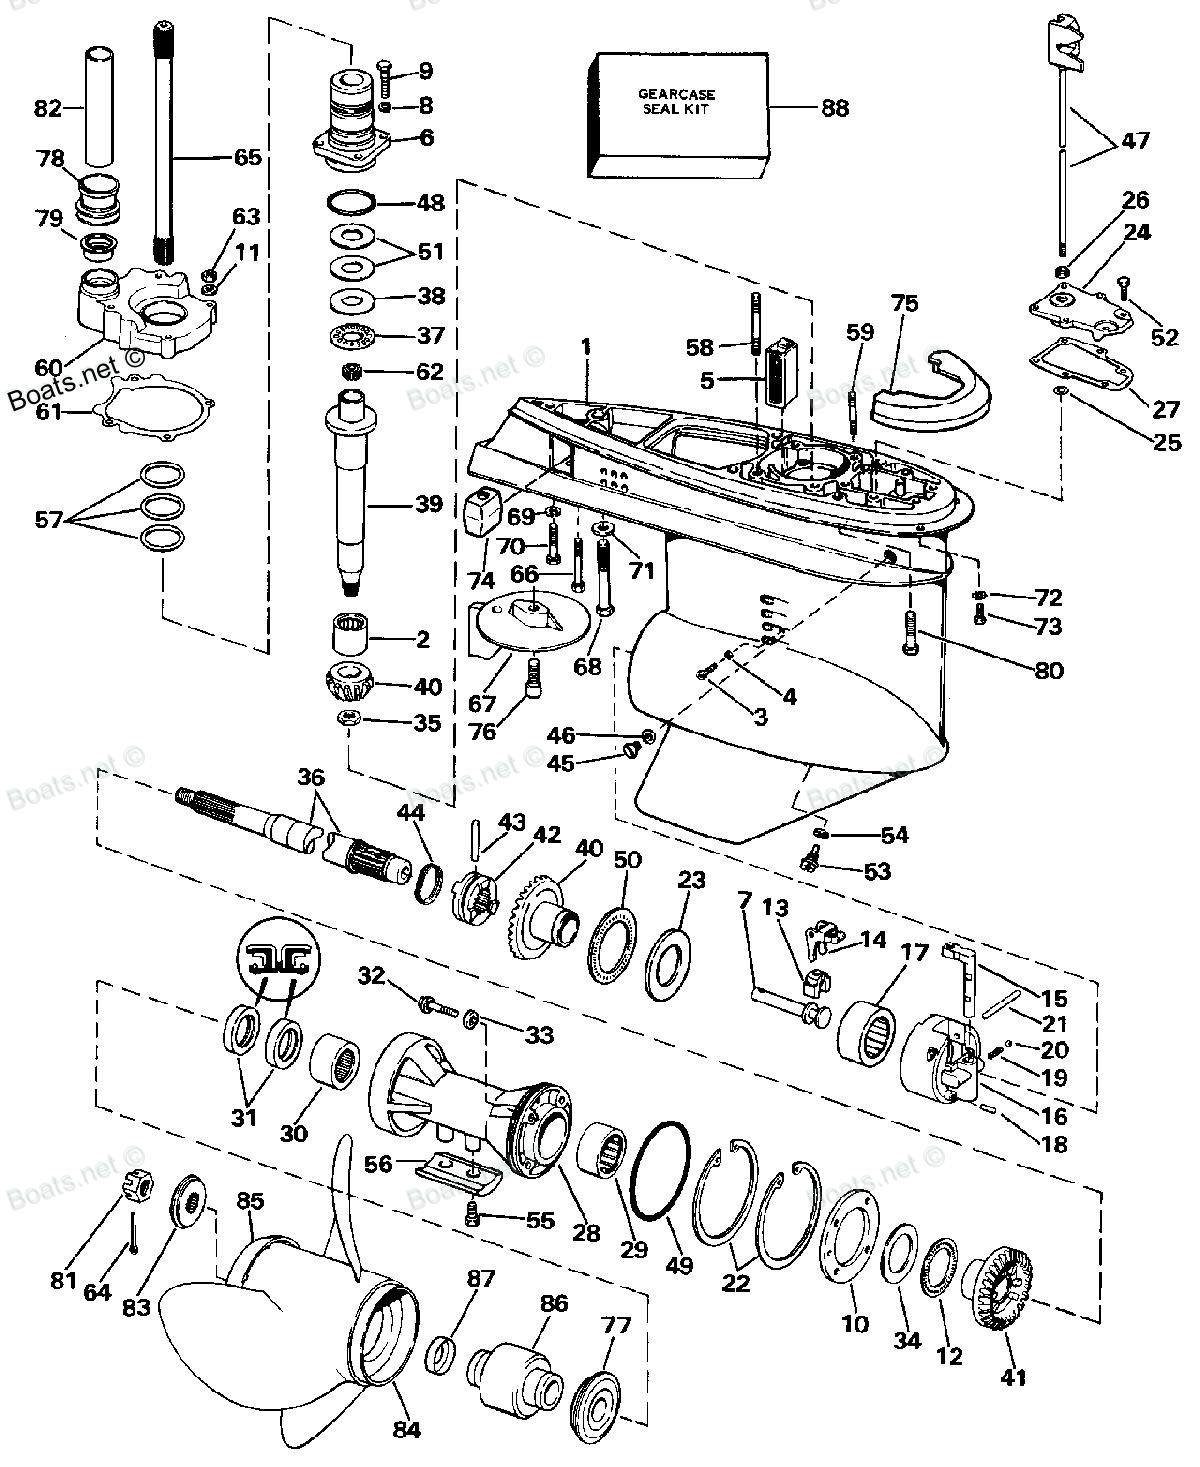 omc cobra upper unit diagram